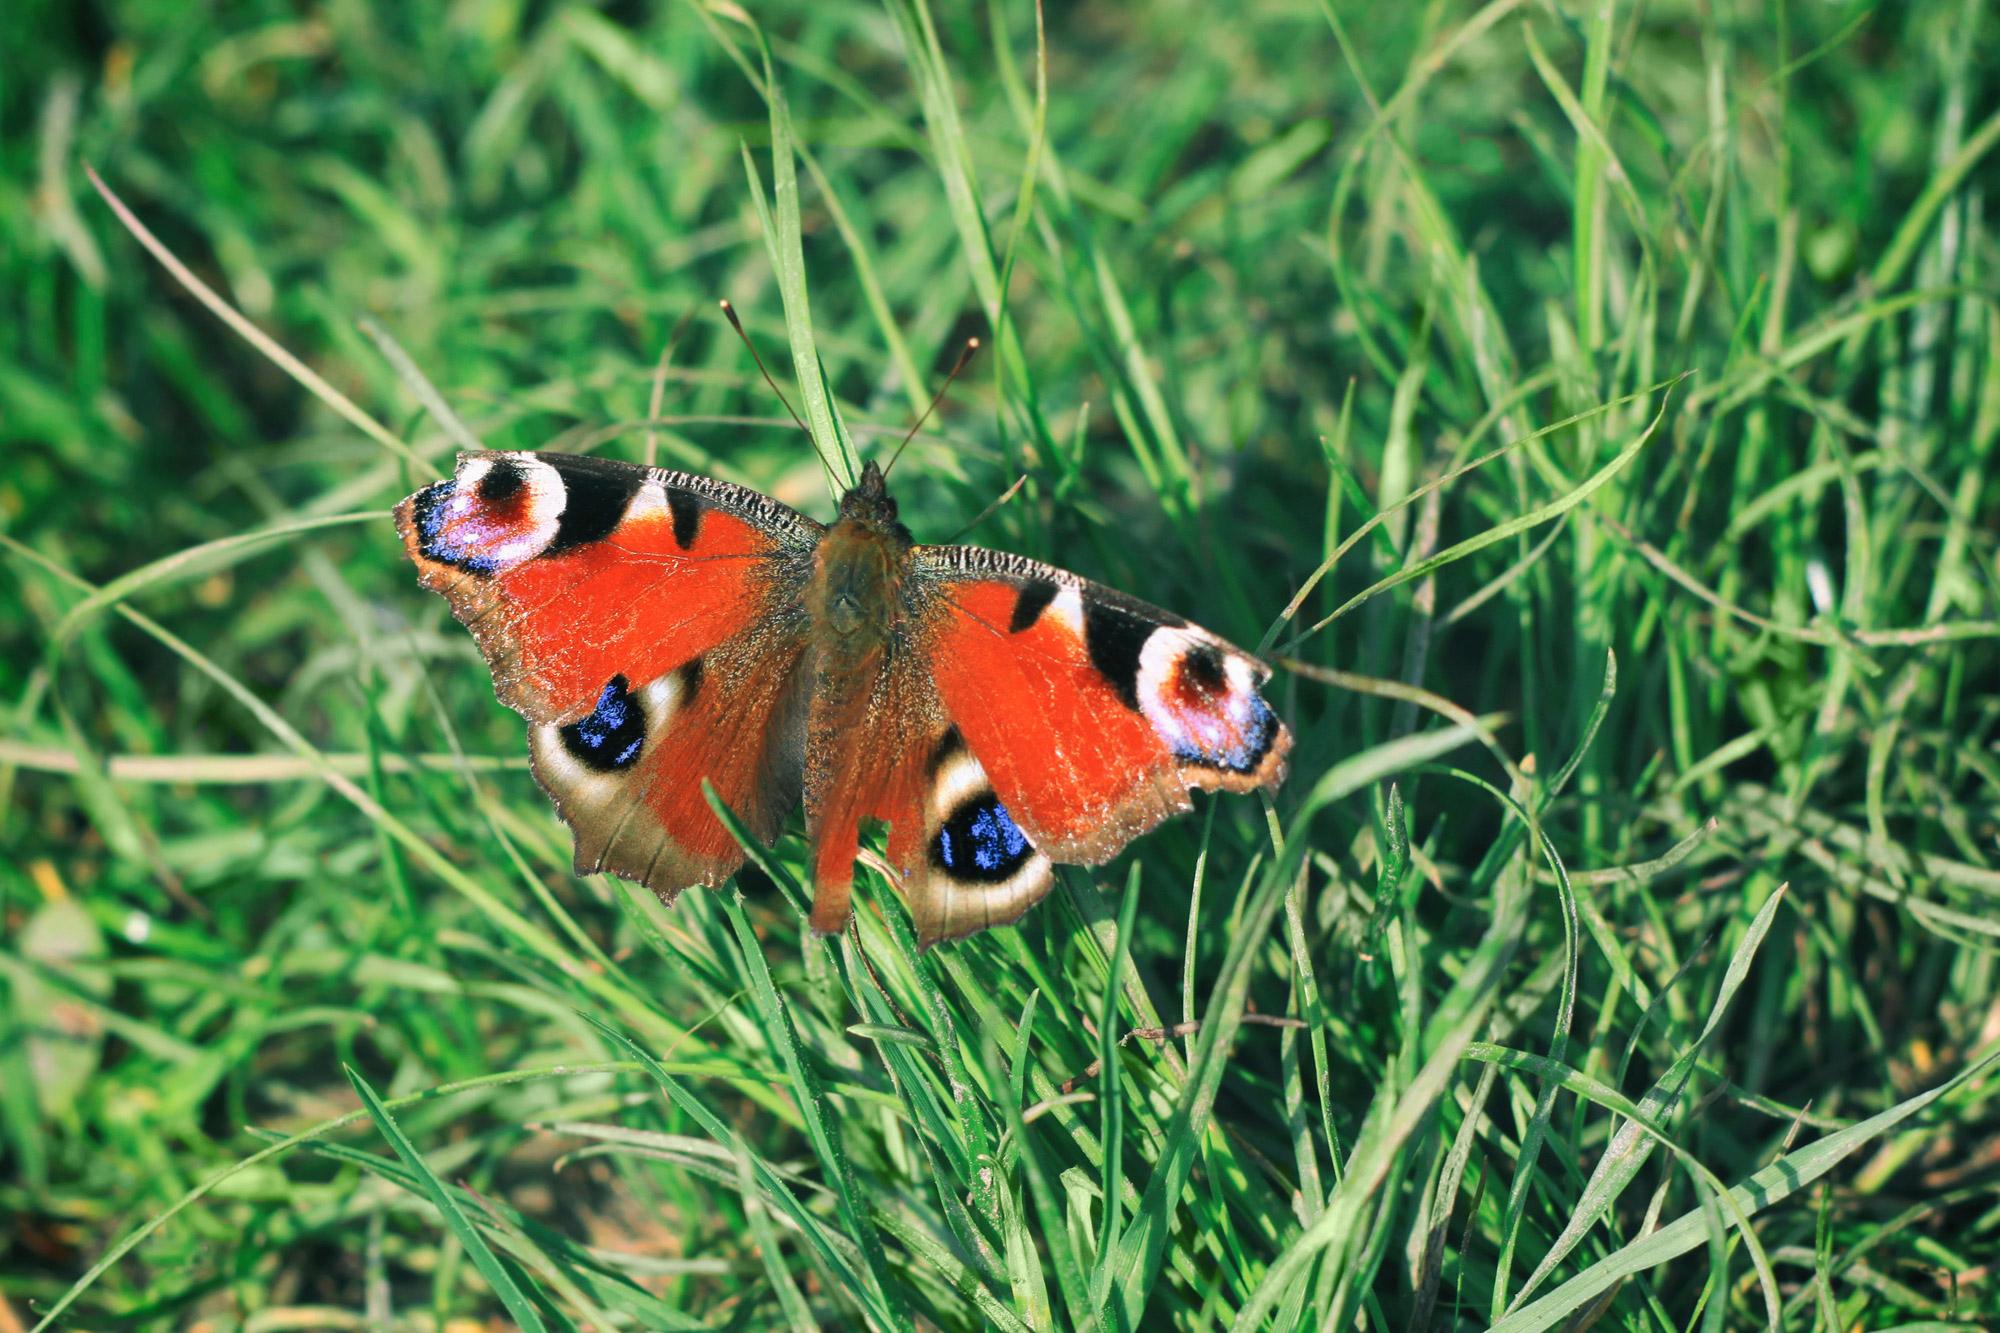 Tagpfauenauge Schmetterling